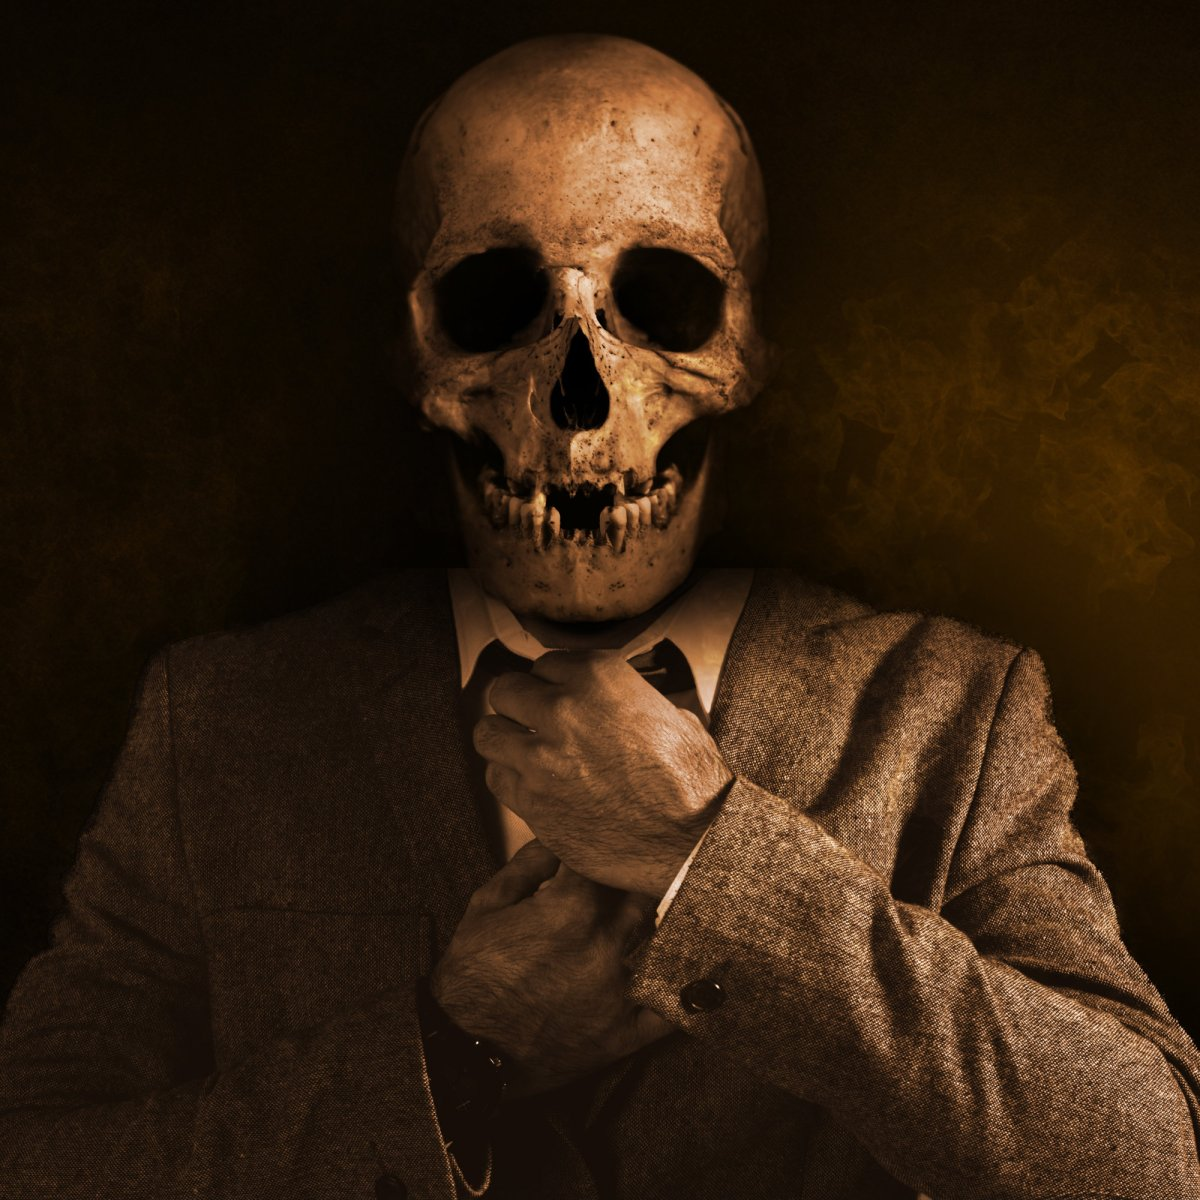 Jeremy Bentham's Head